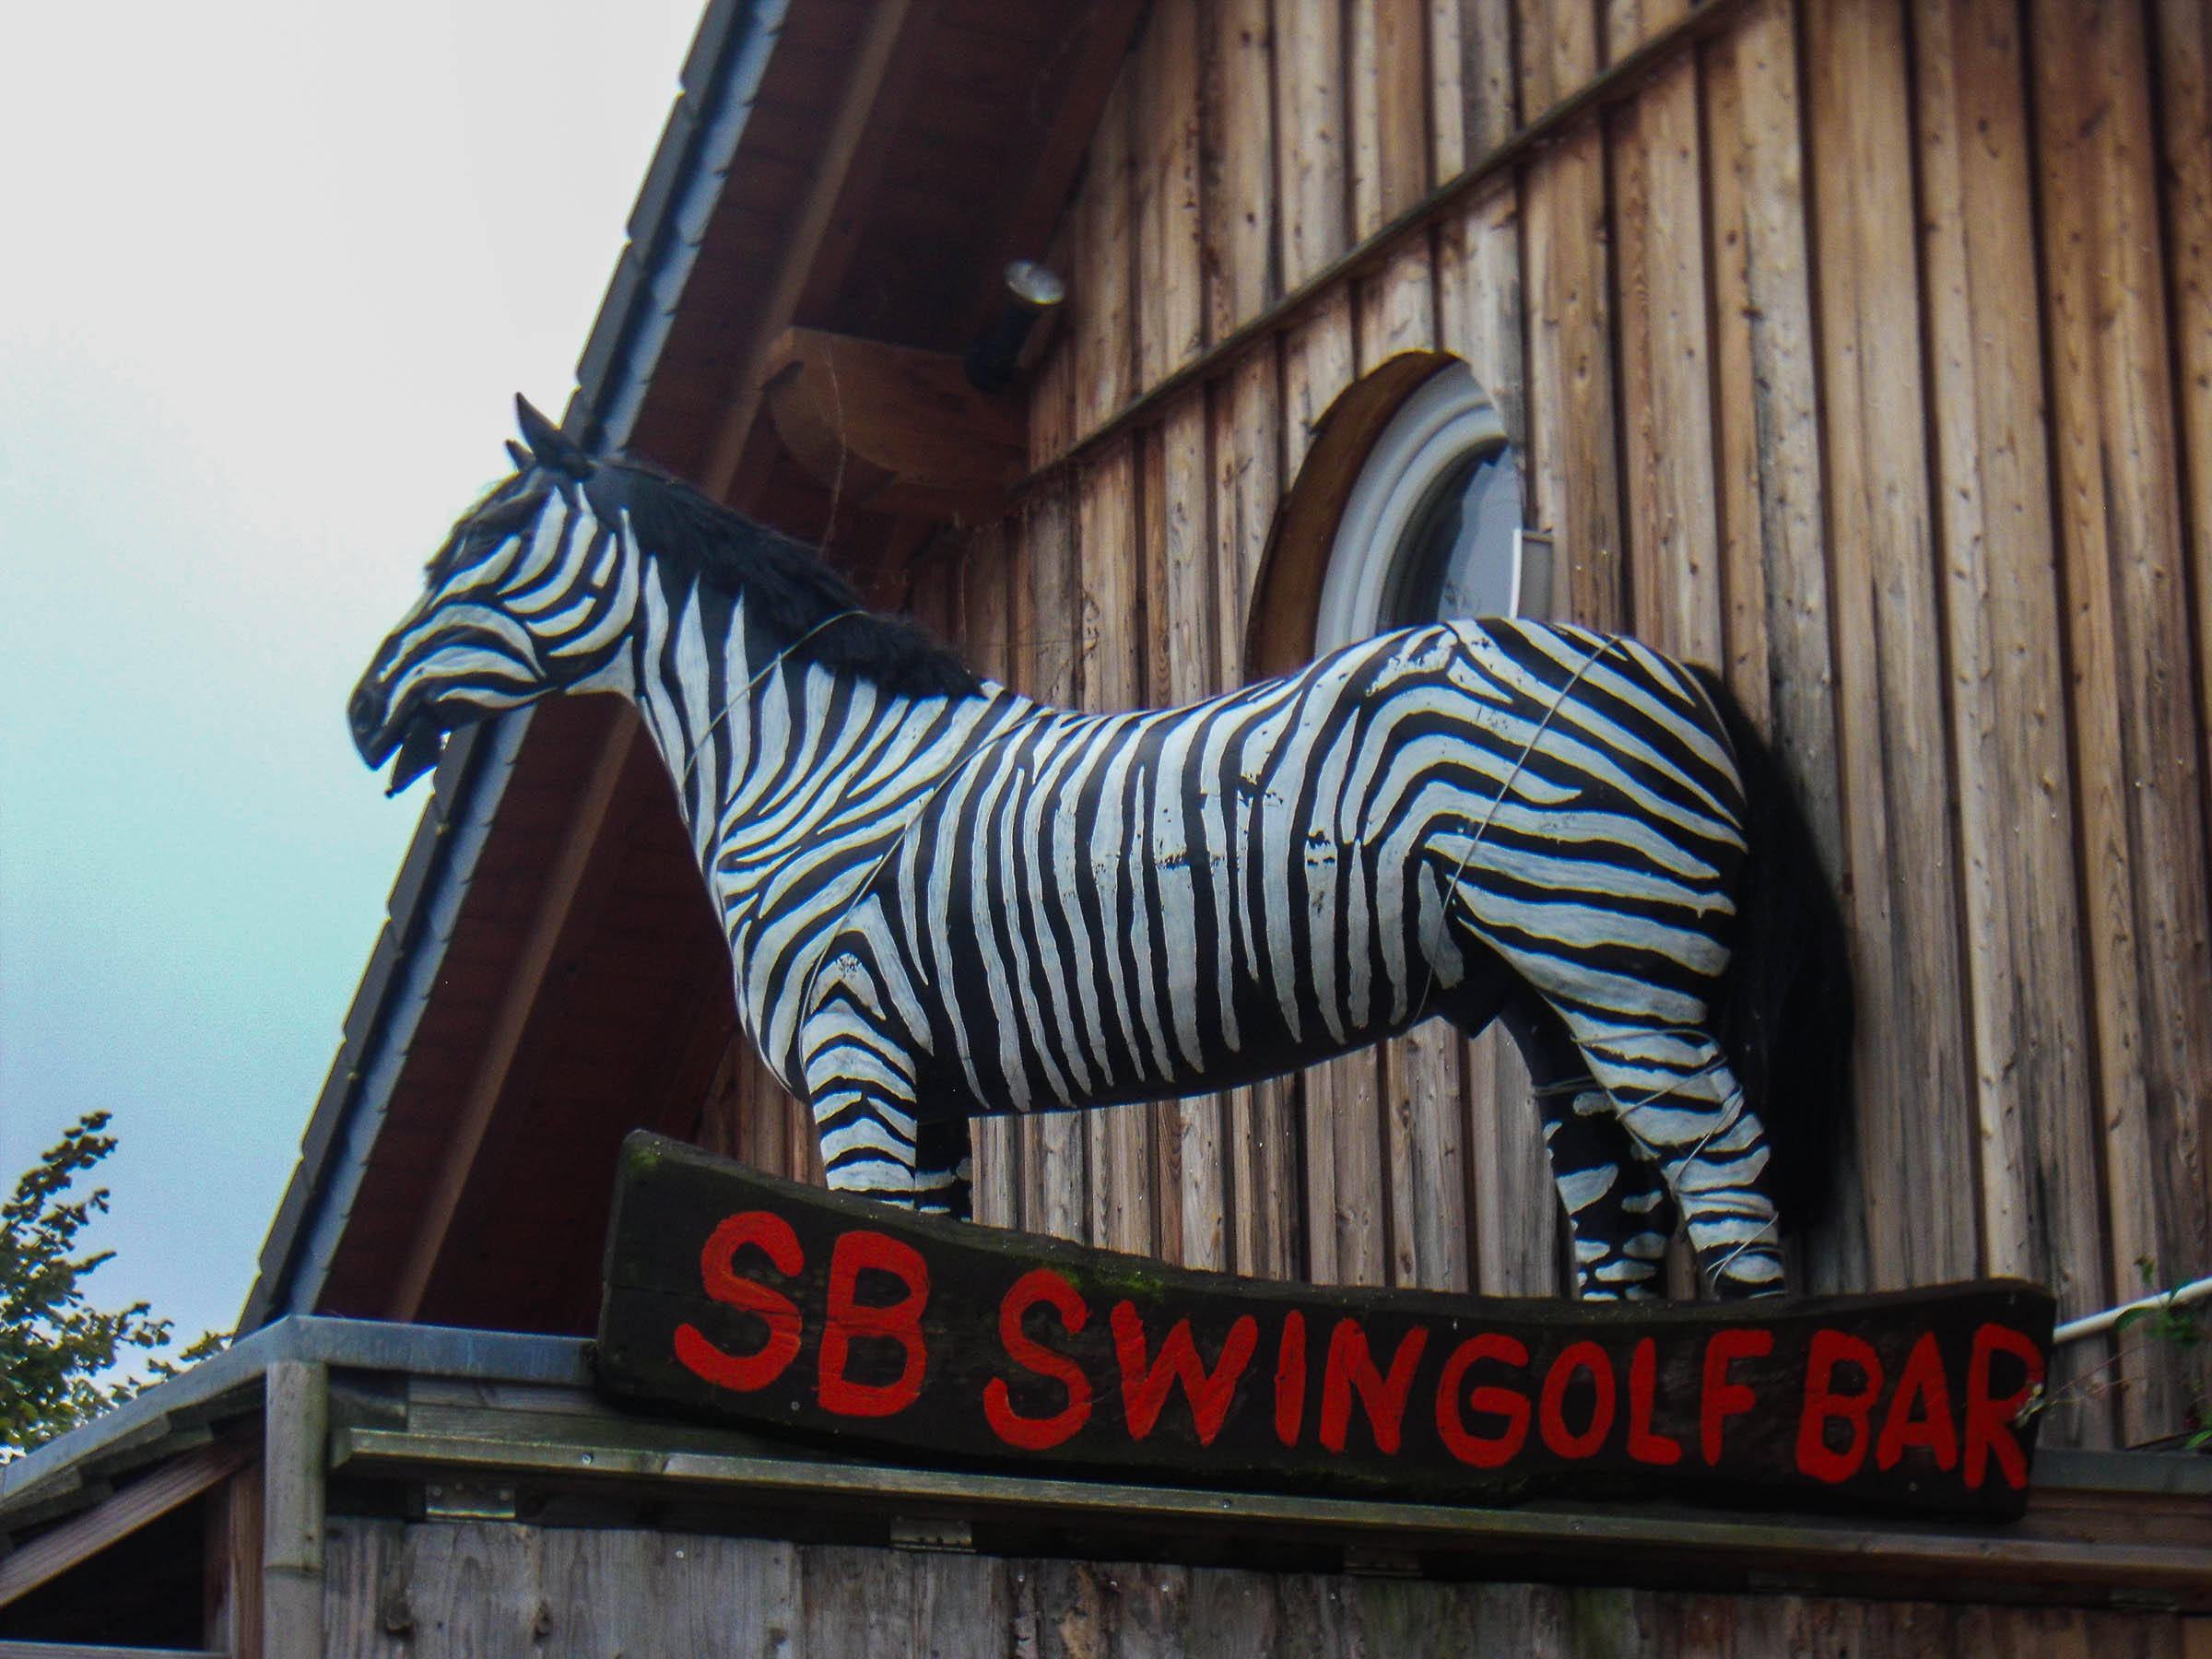 20150925_Swingolf_03.jpg